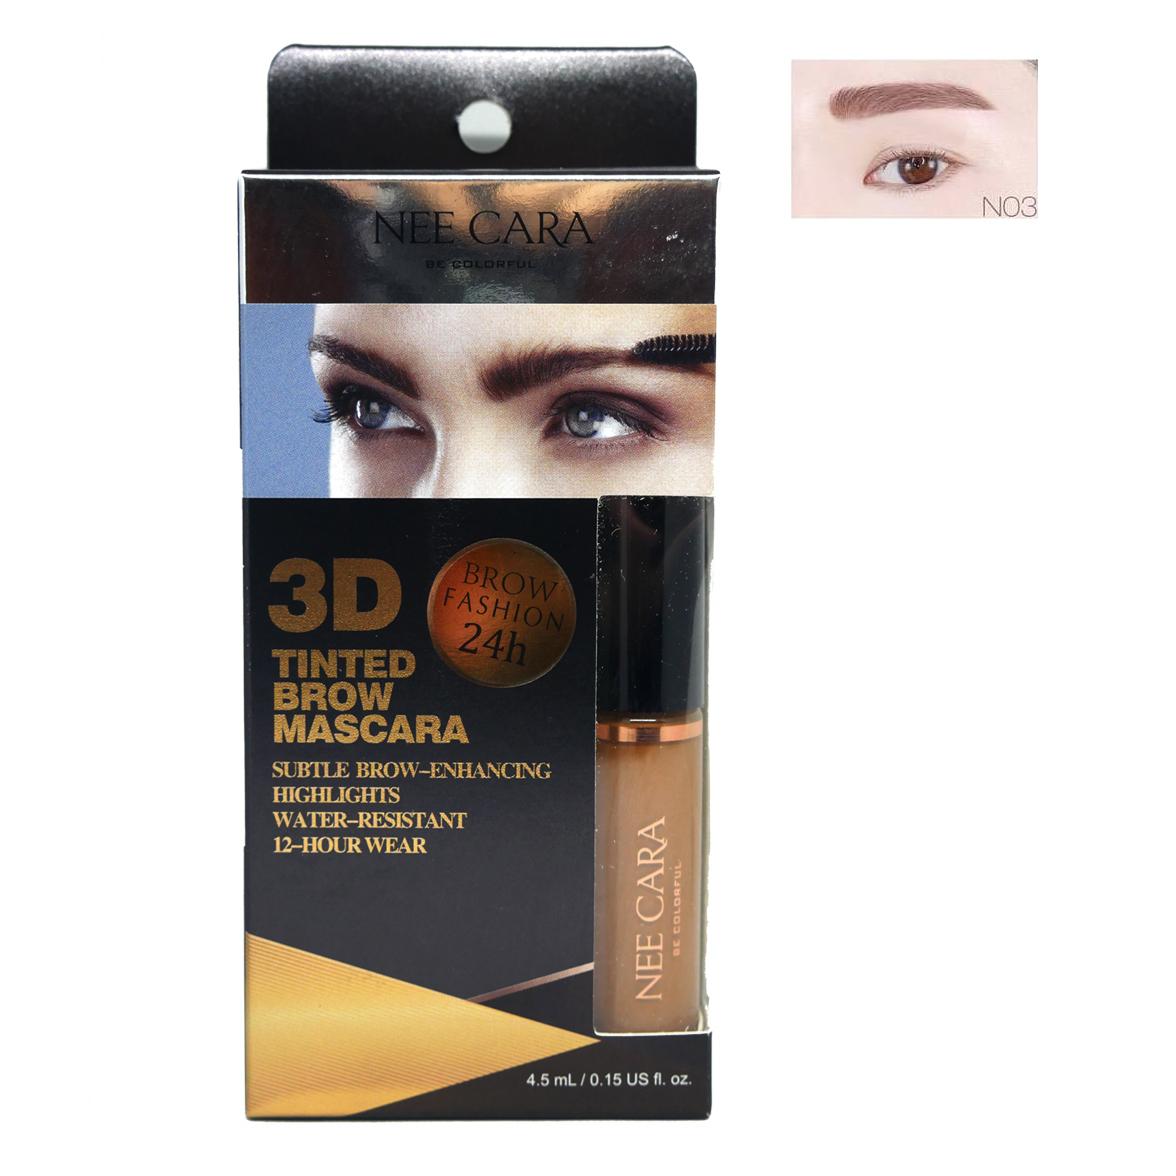 Nee Cara 3D TINTED BROW MASCARA N558 มาสคาร่าคิ้ว No.03